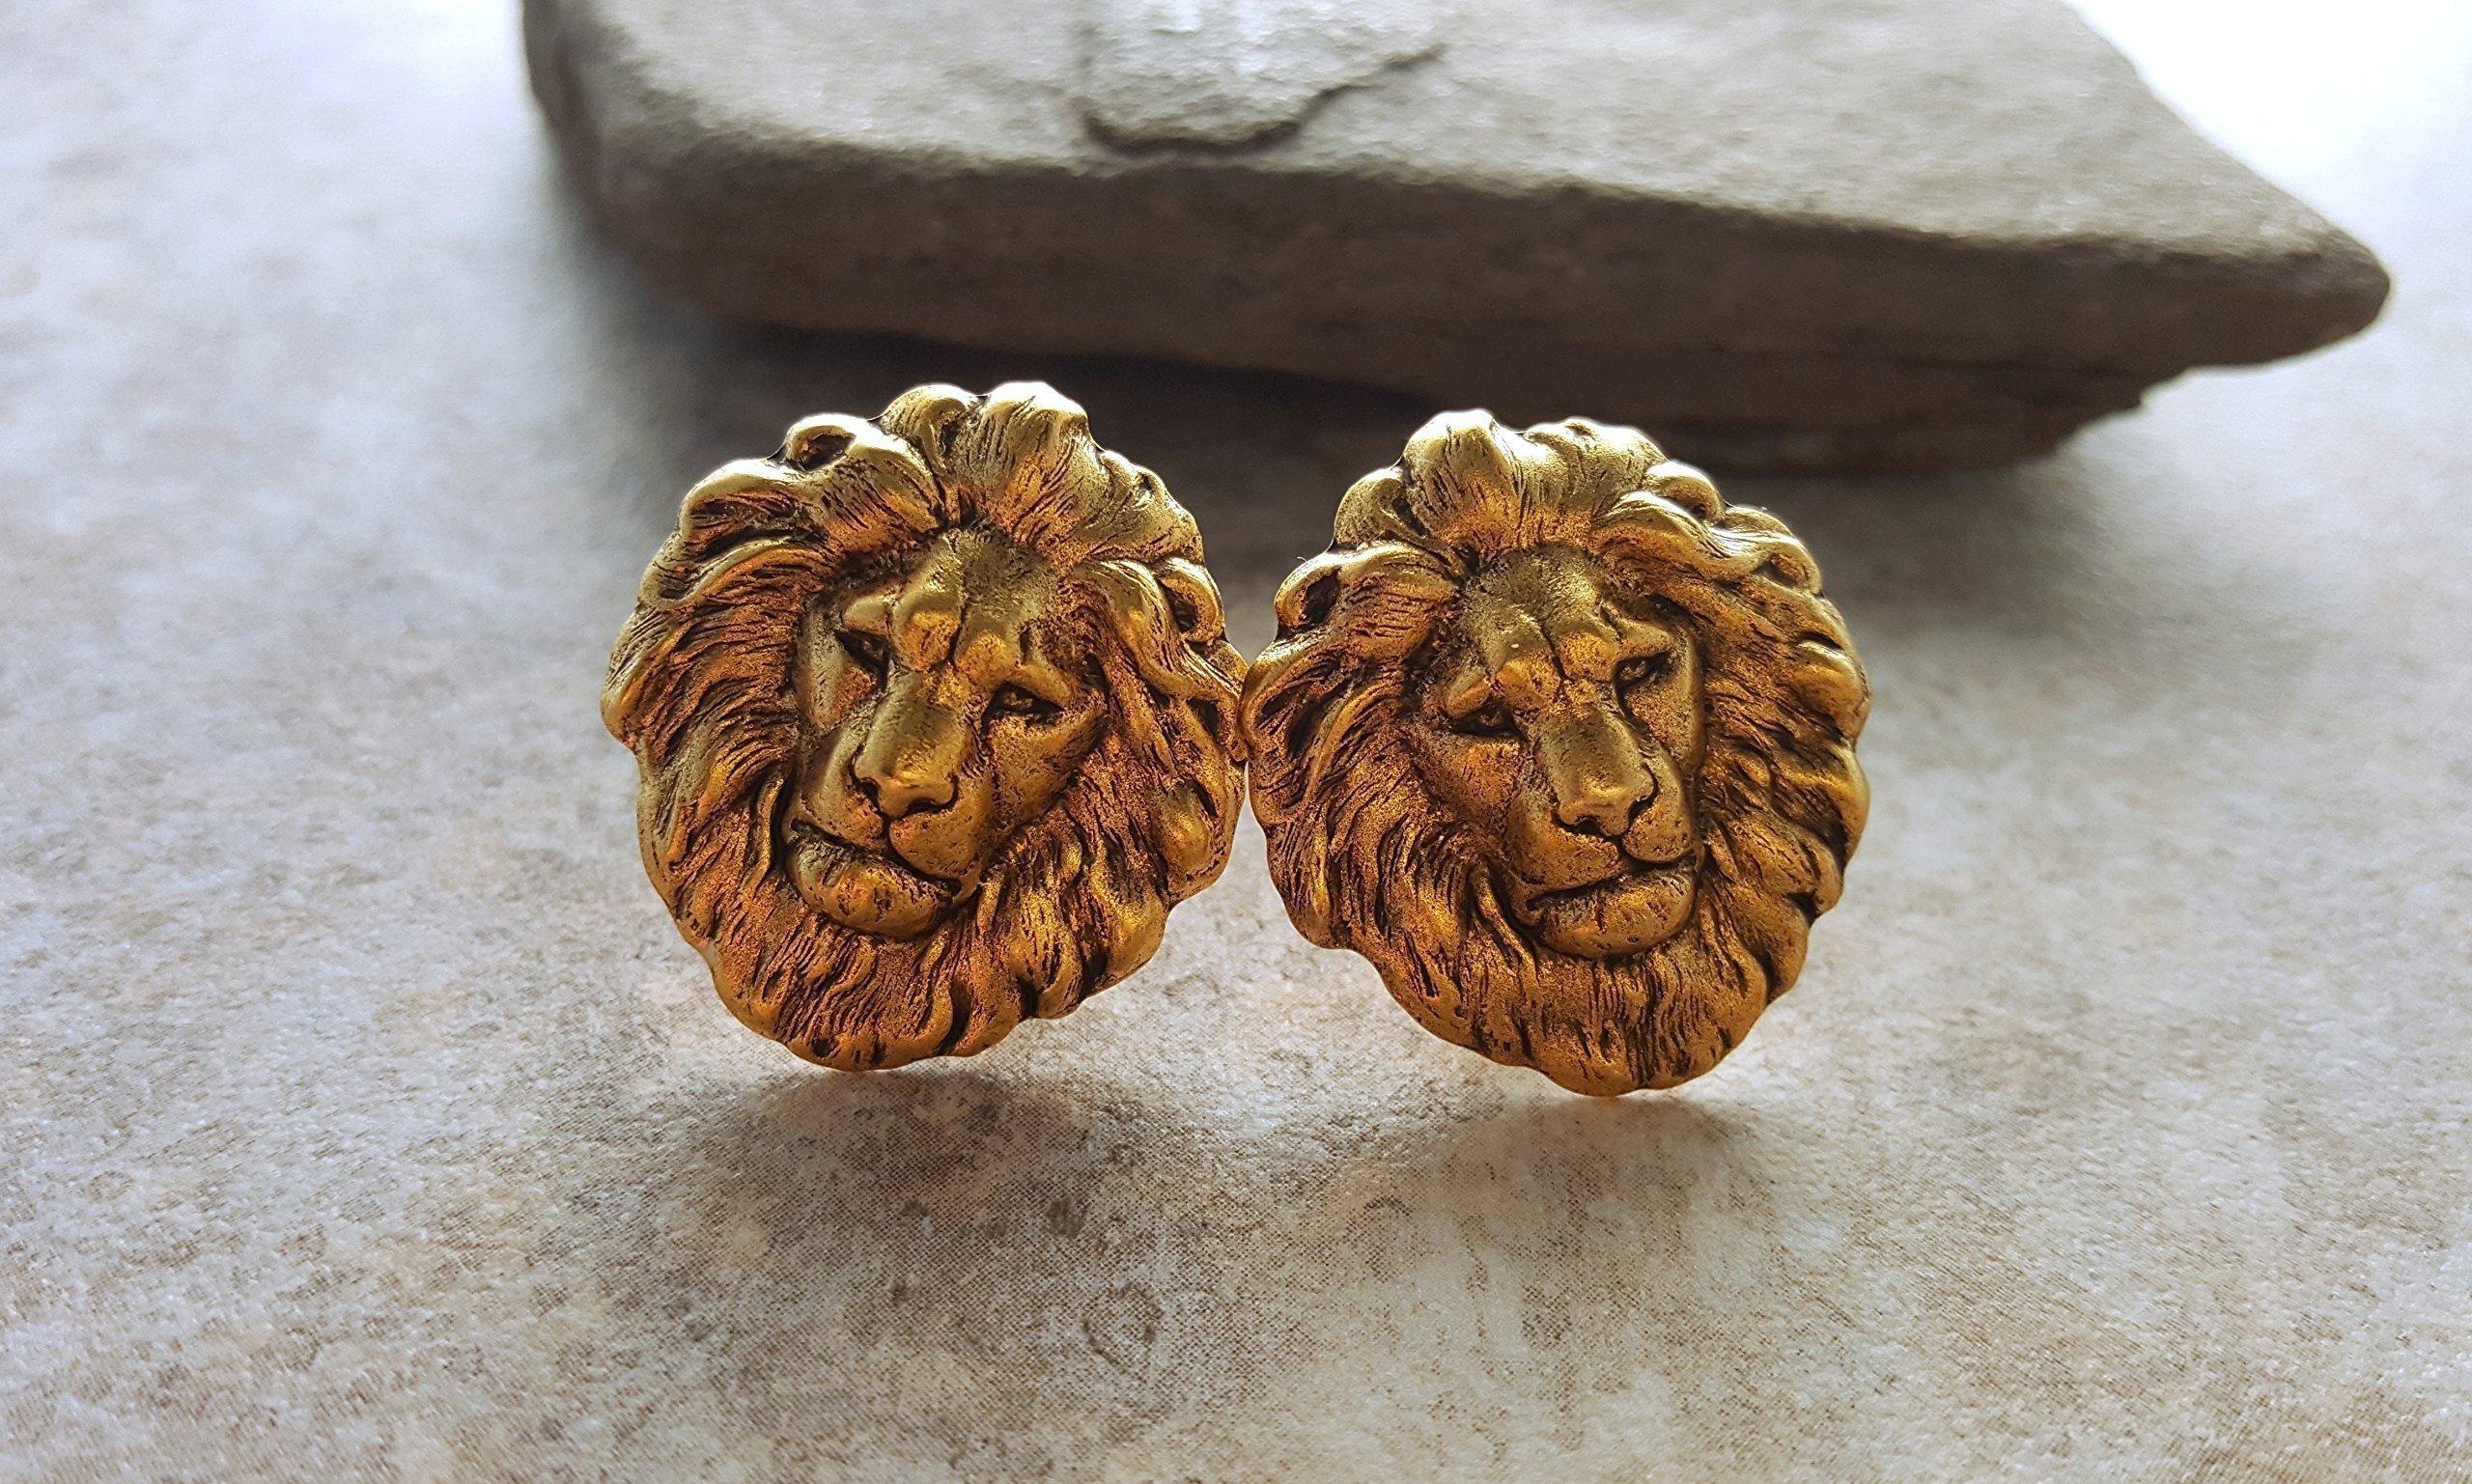 Handmade Oxidized Gold Lion Cuff Links